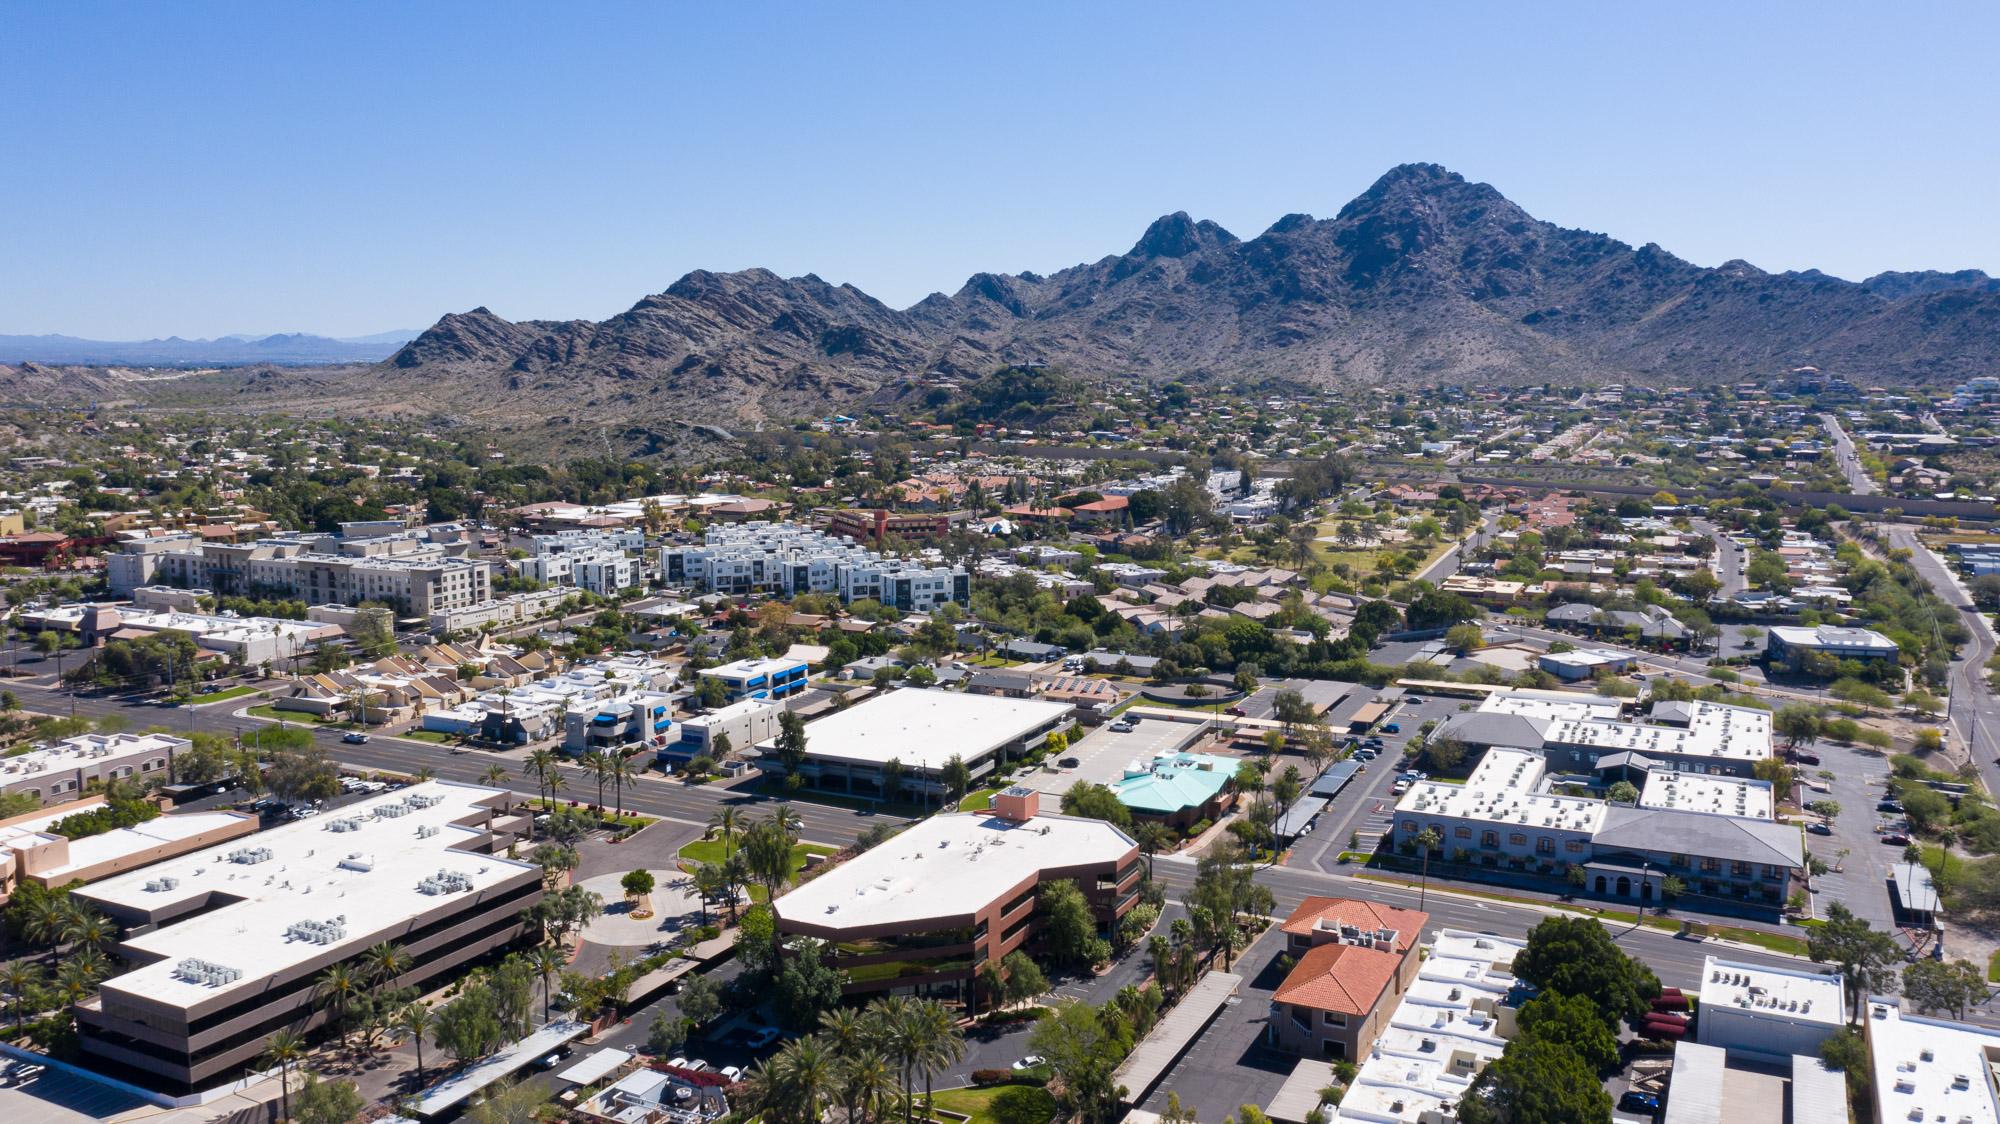 7250 N. 16th Street – Phoenix